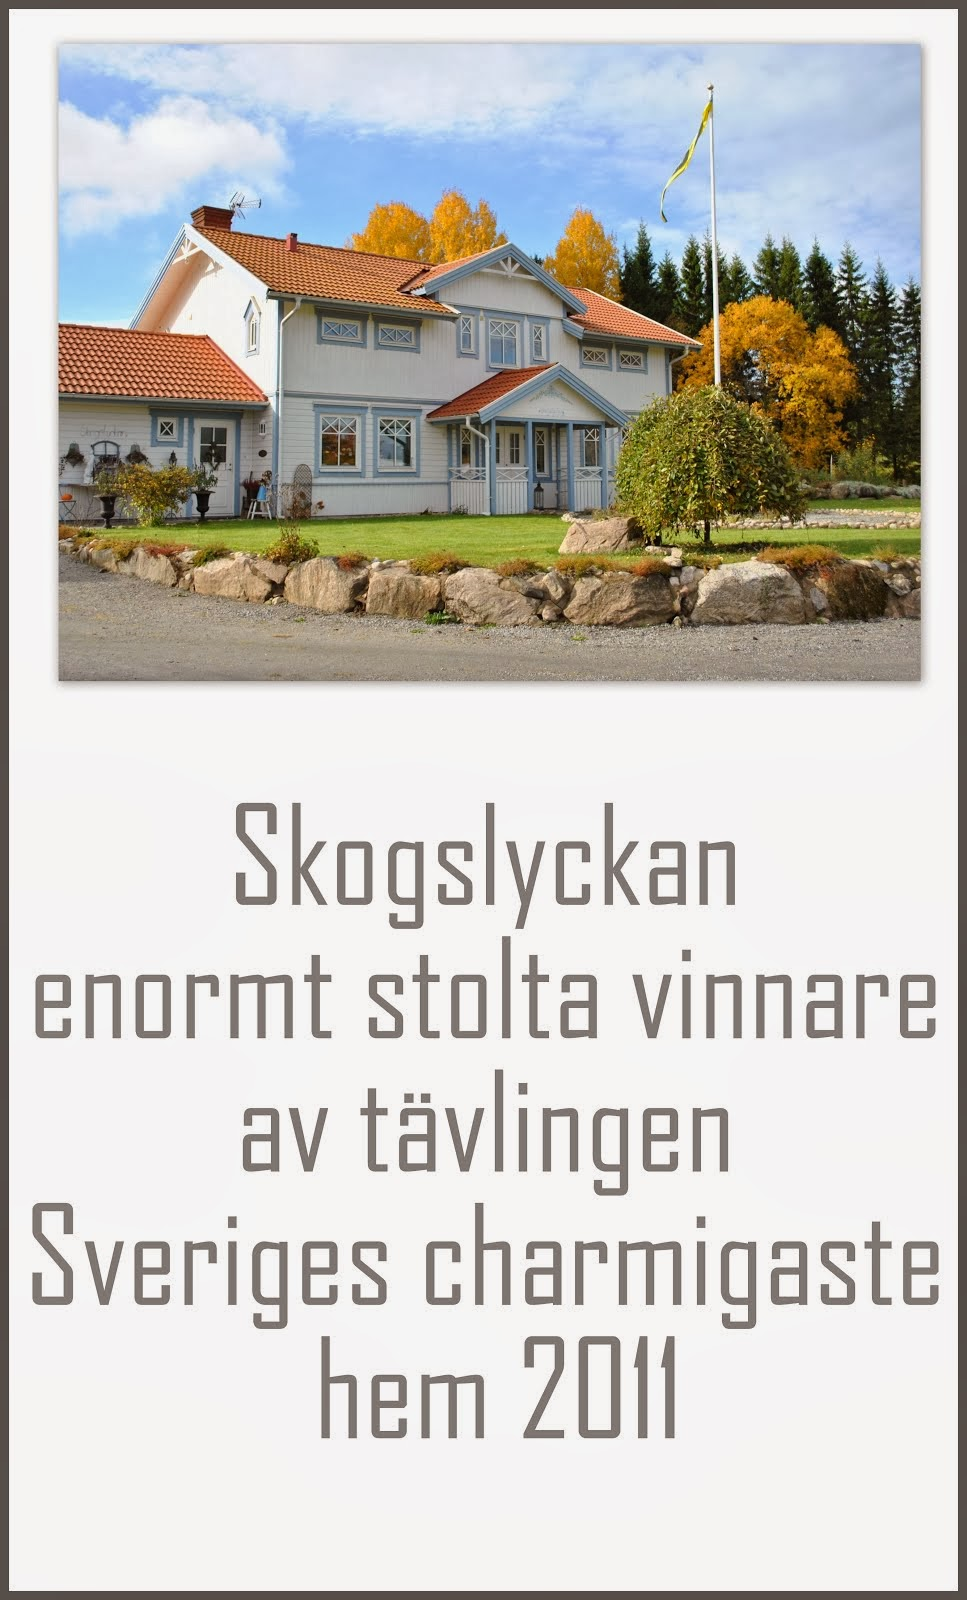 Sveriges charmigaste hem 2011